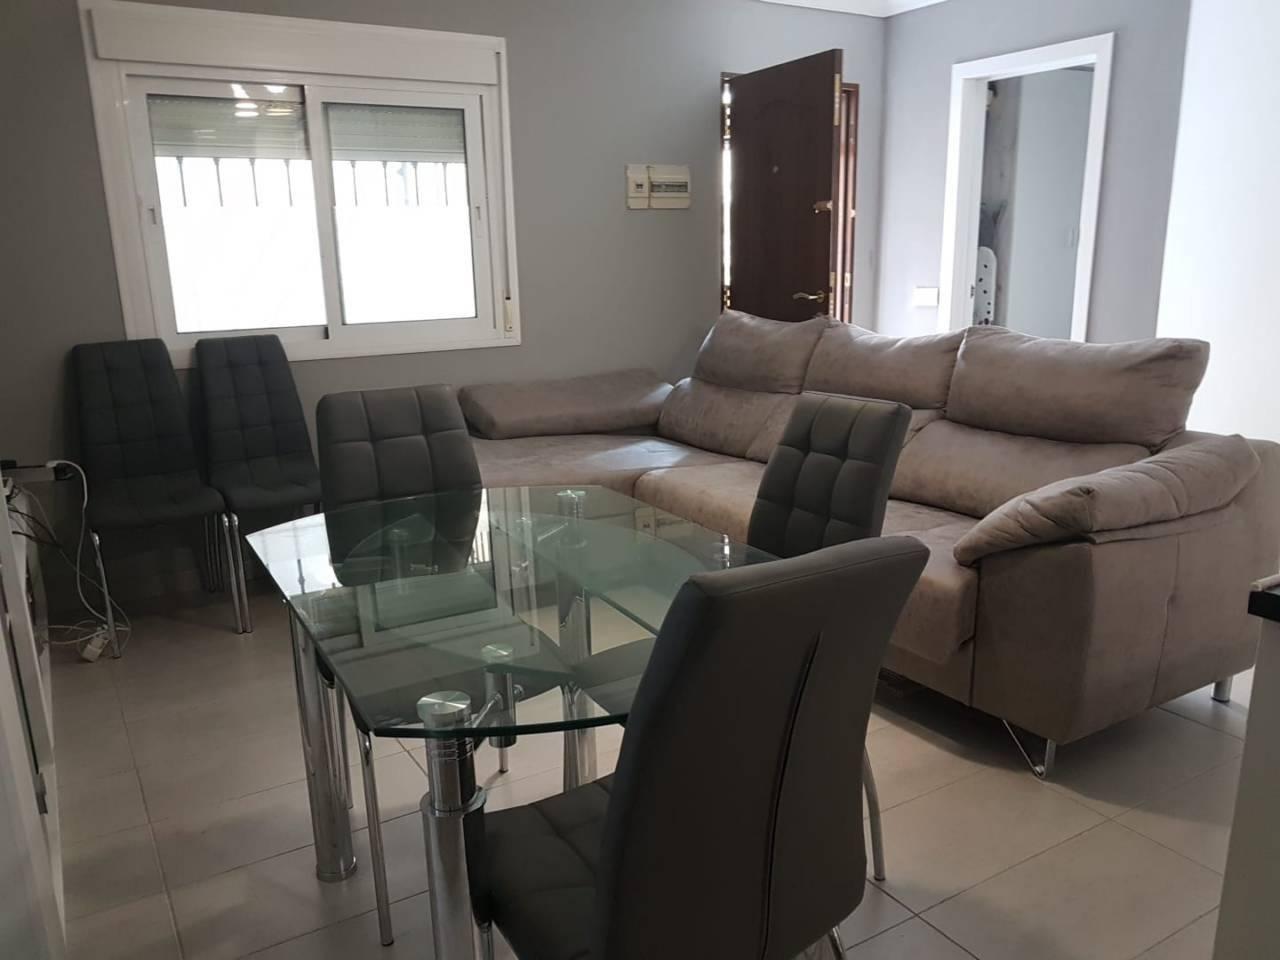 Apartamento en venta en Estepona en Avda Andalucia, Plaza: Doctor Mena Arce